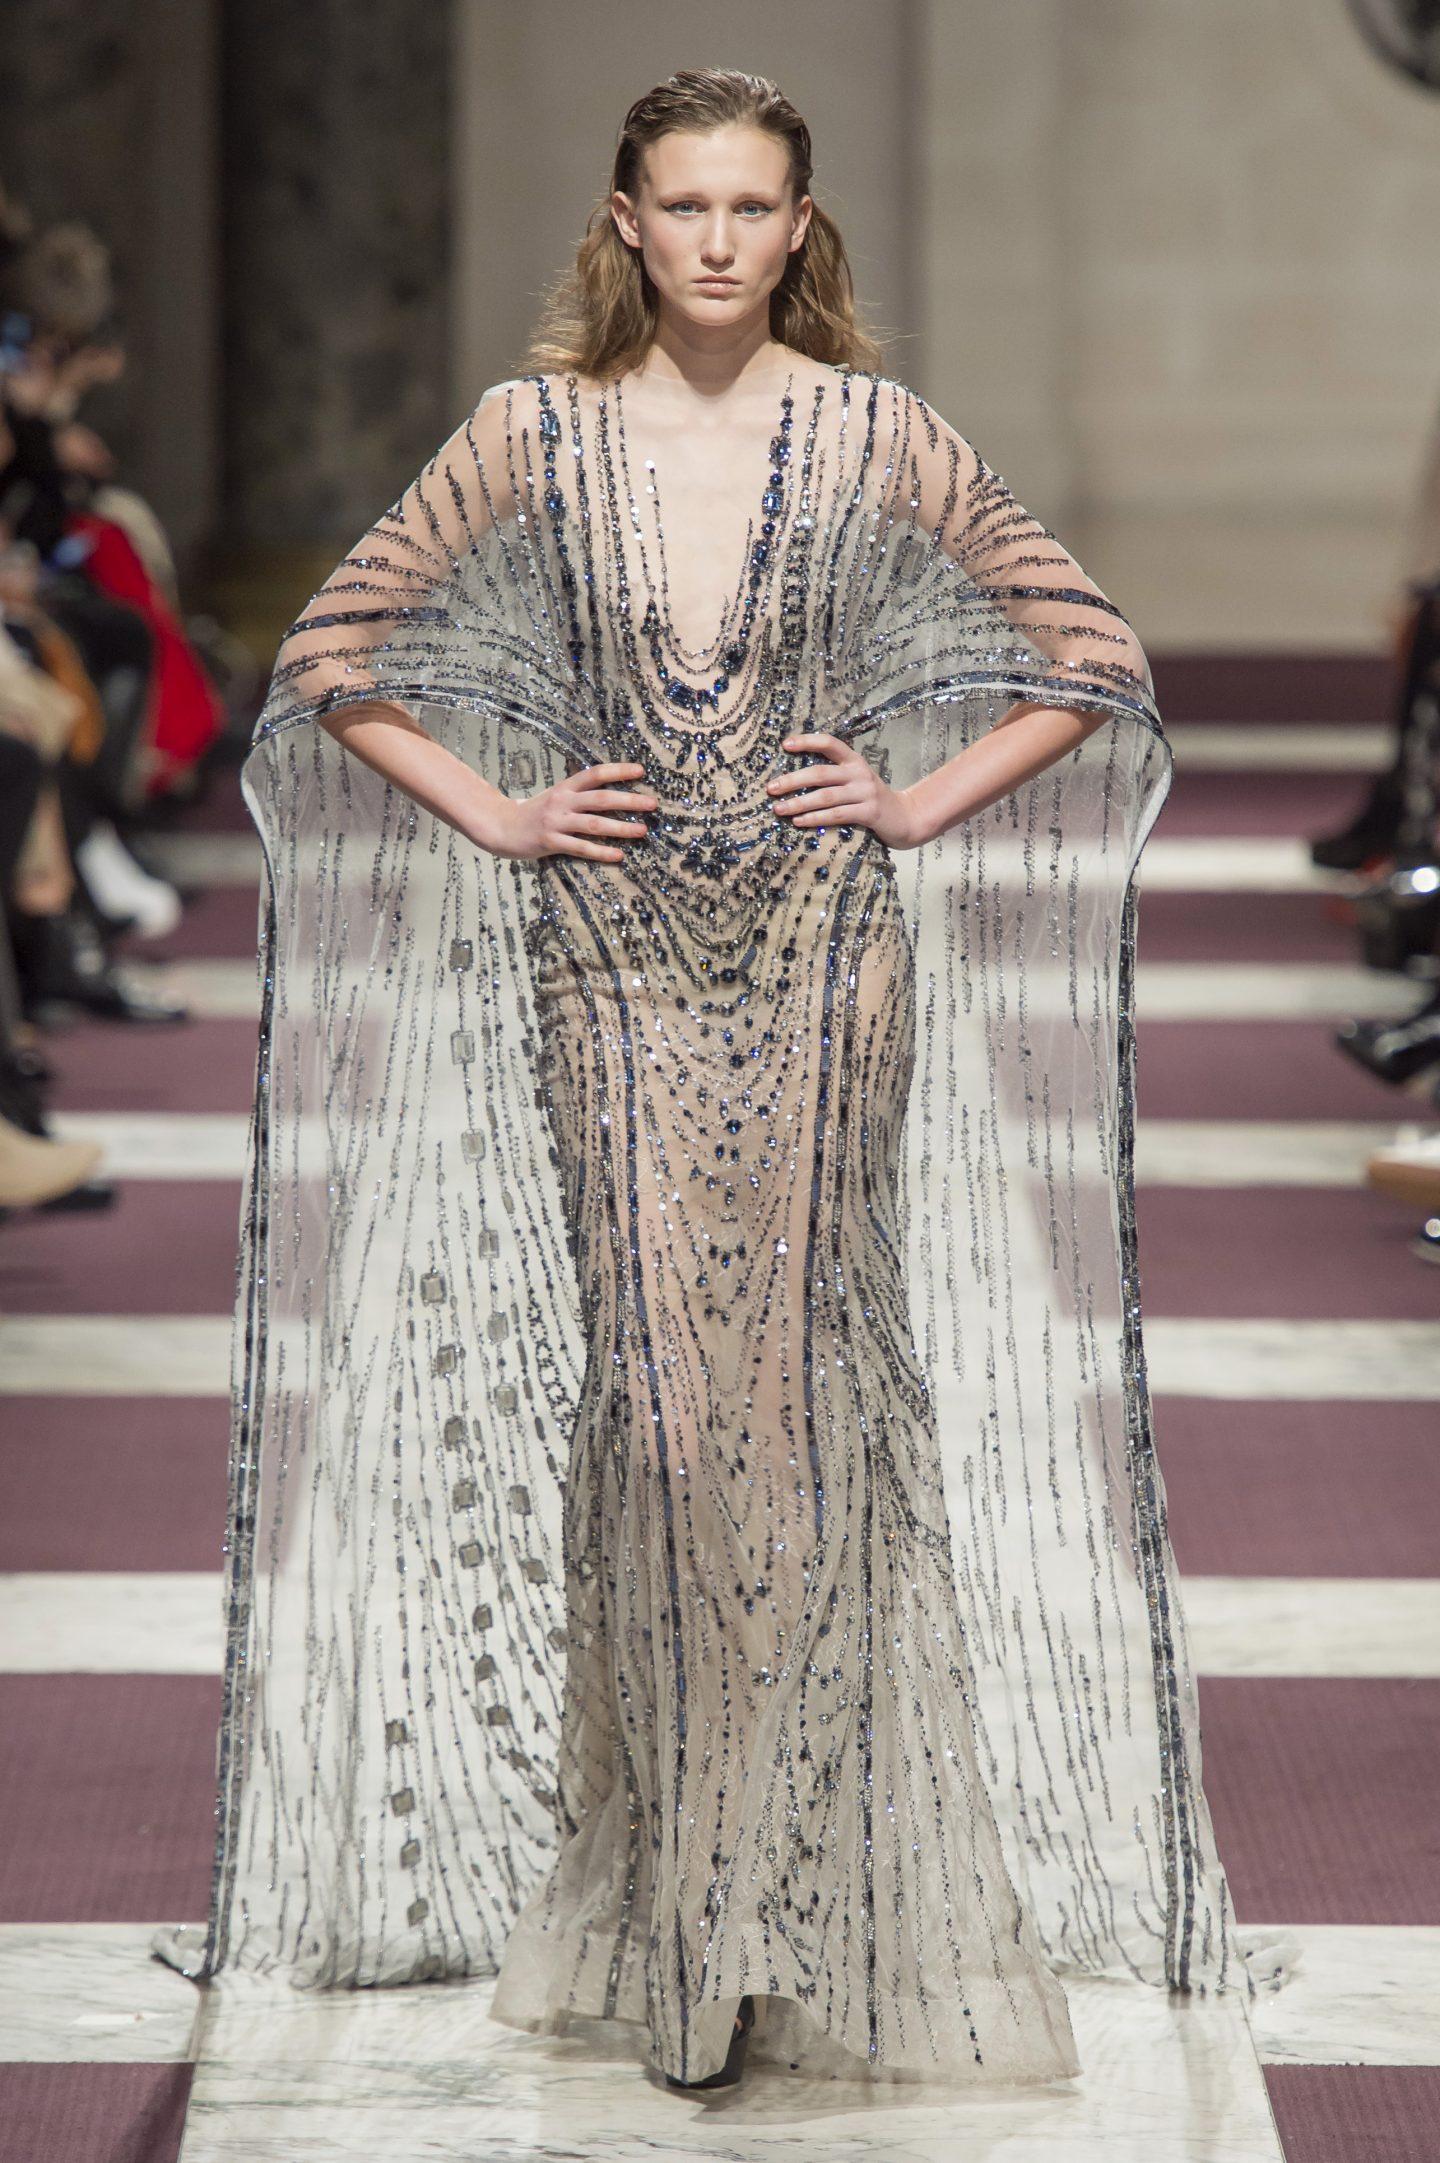 Paris Haute Couture Week: ZIAD NAKAD